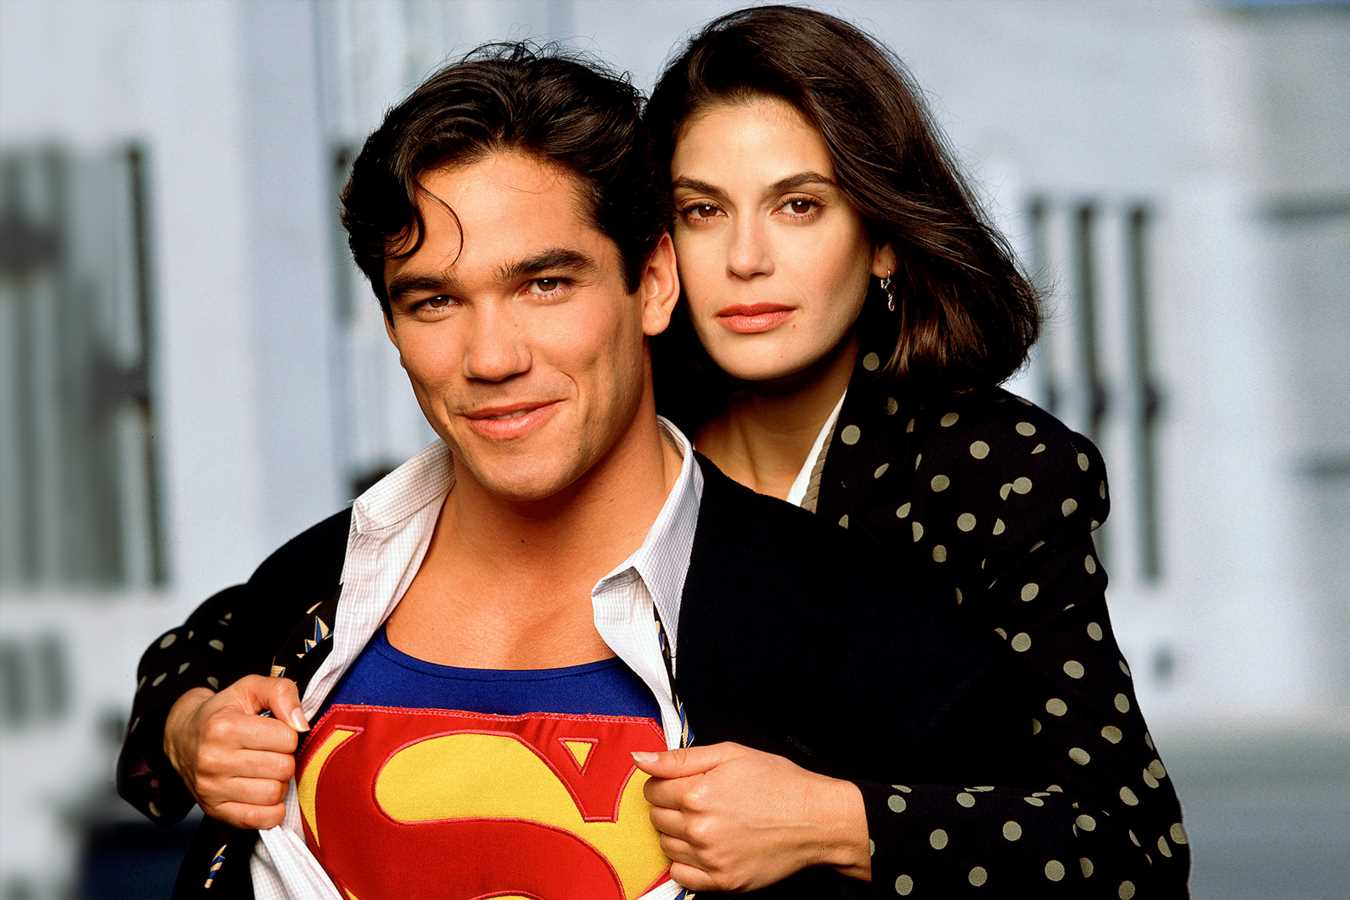 Dean Cain says he's writing an idea for a Lois and Clark revival